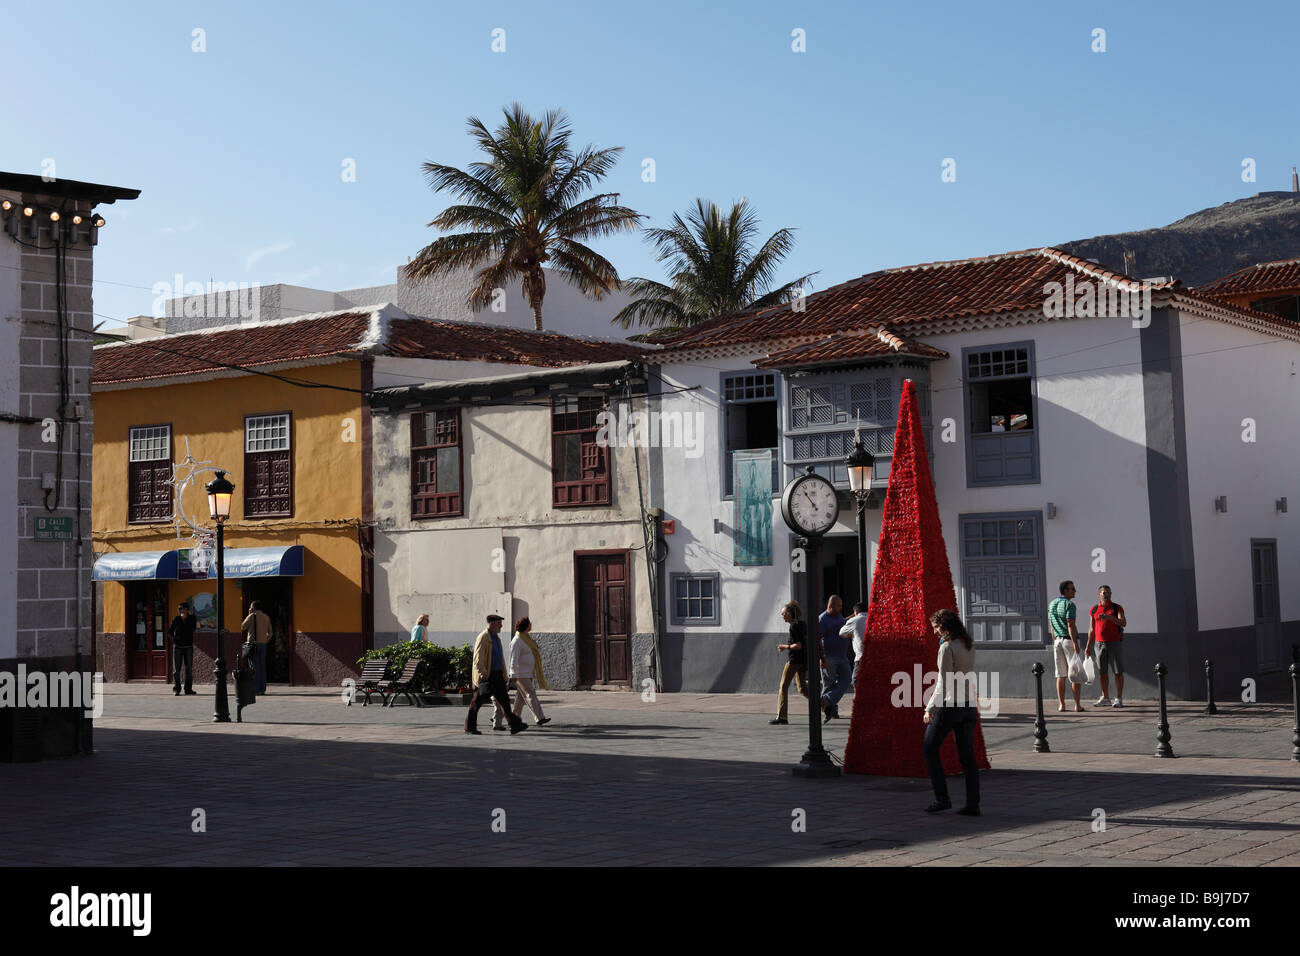 Calle del Medio, Altstadt, San Sebastián De La Gomera, Kanarische Inseln, Spanien, Europa Stockbild